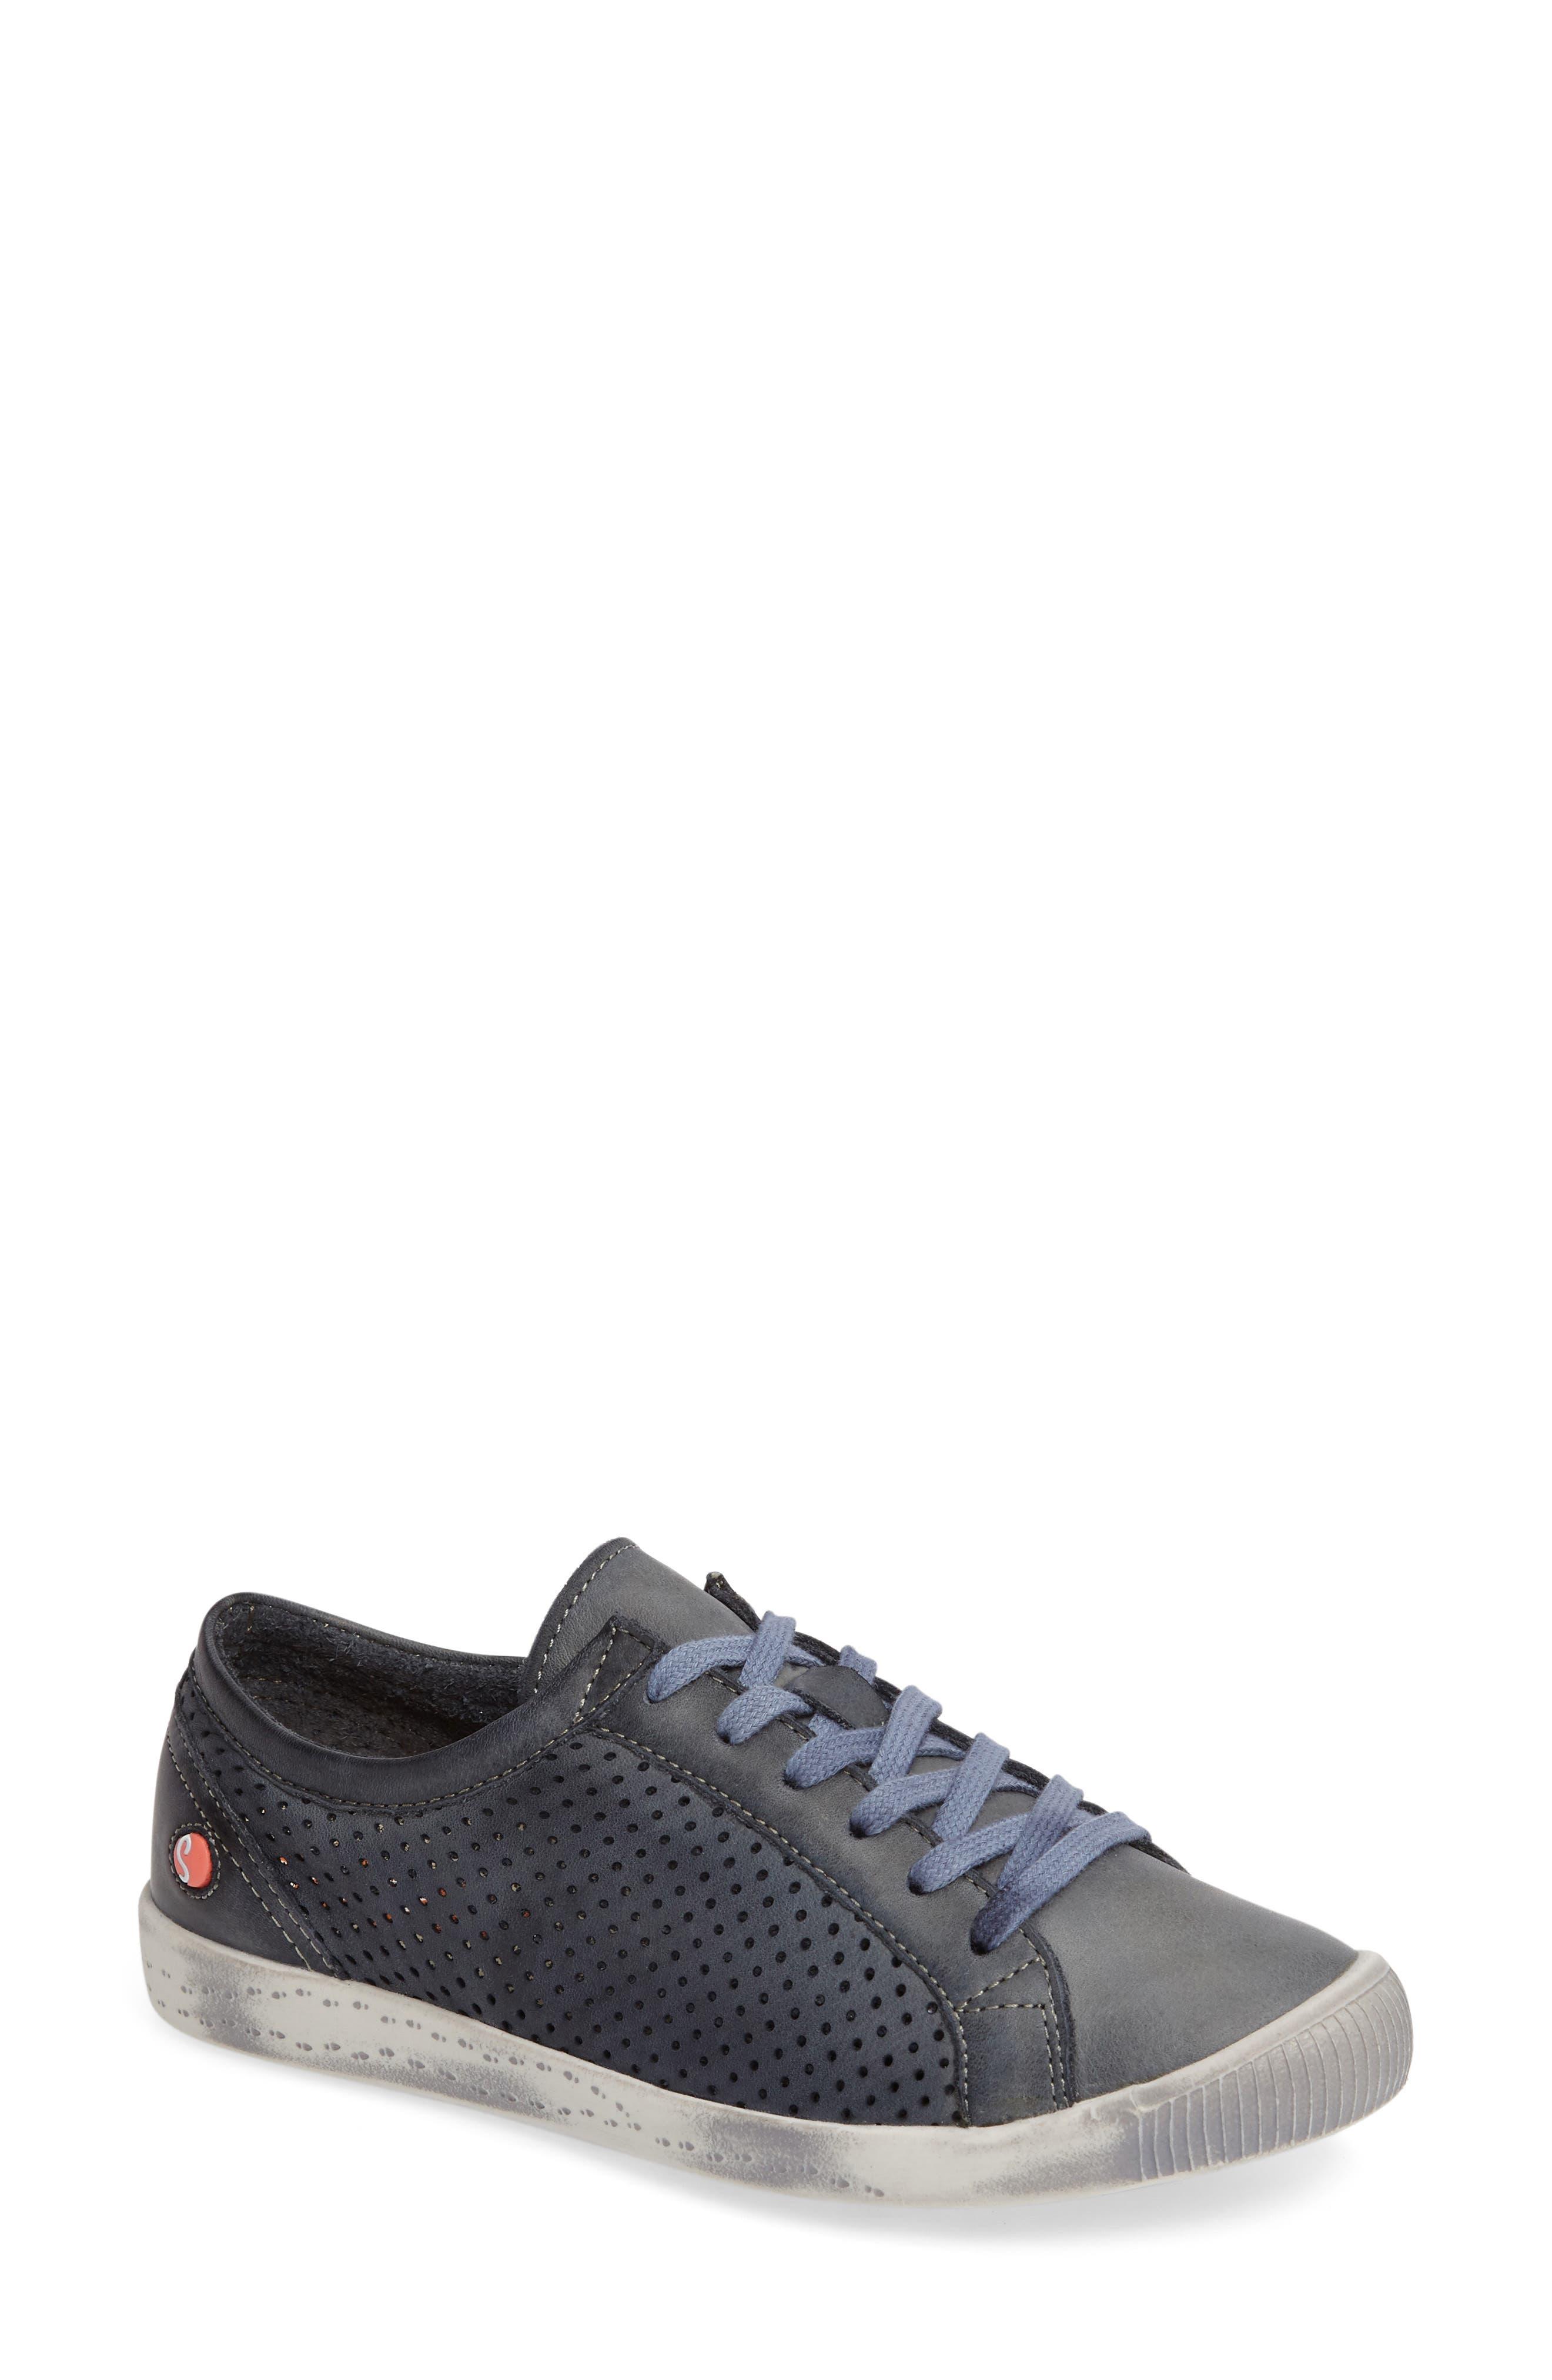 Ica Sneaker,                             Main thumbnail 7, color,